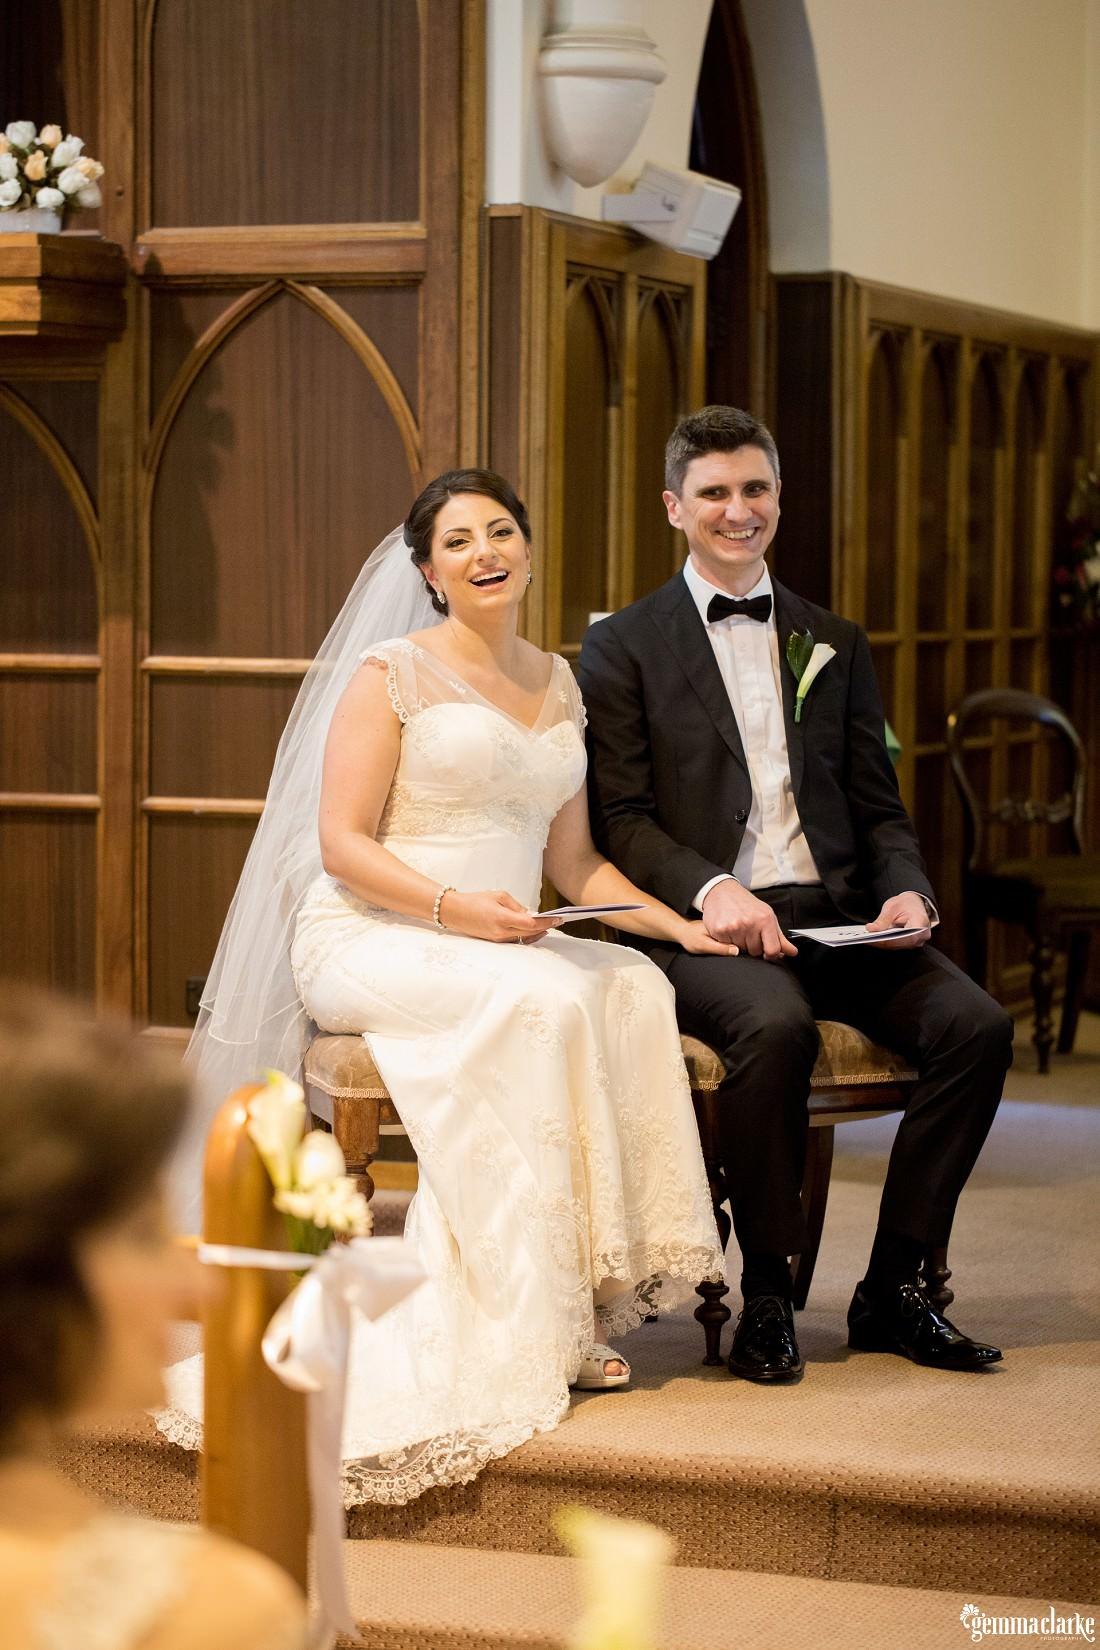 gemma-clarke-photography_botanic-gardens-wedding-reception_amanda-and-dylan_0020